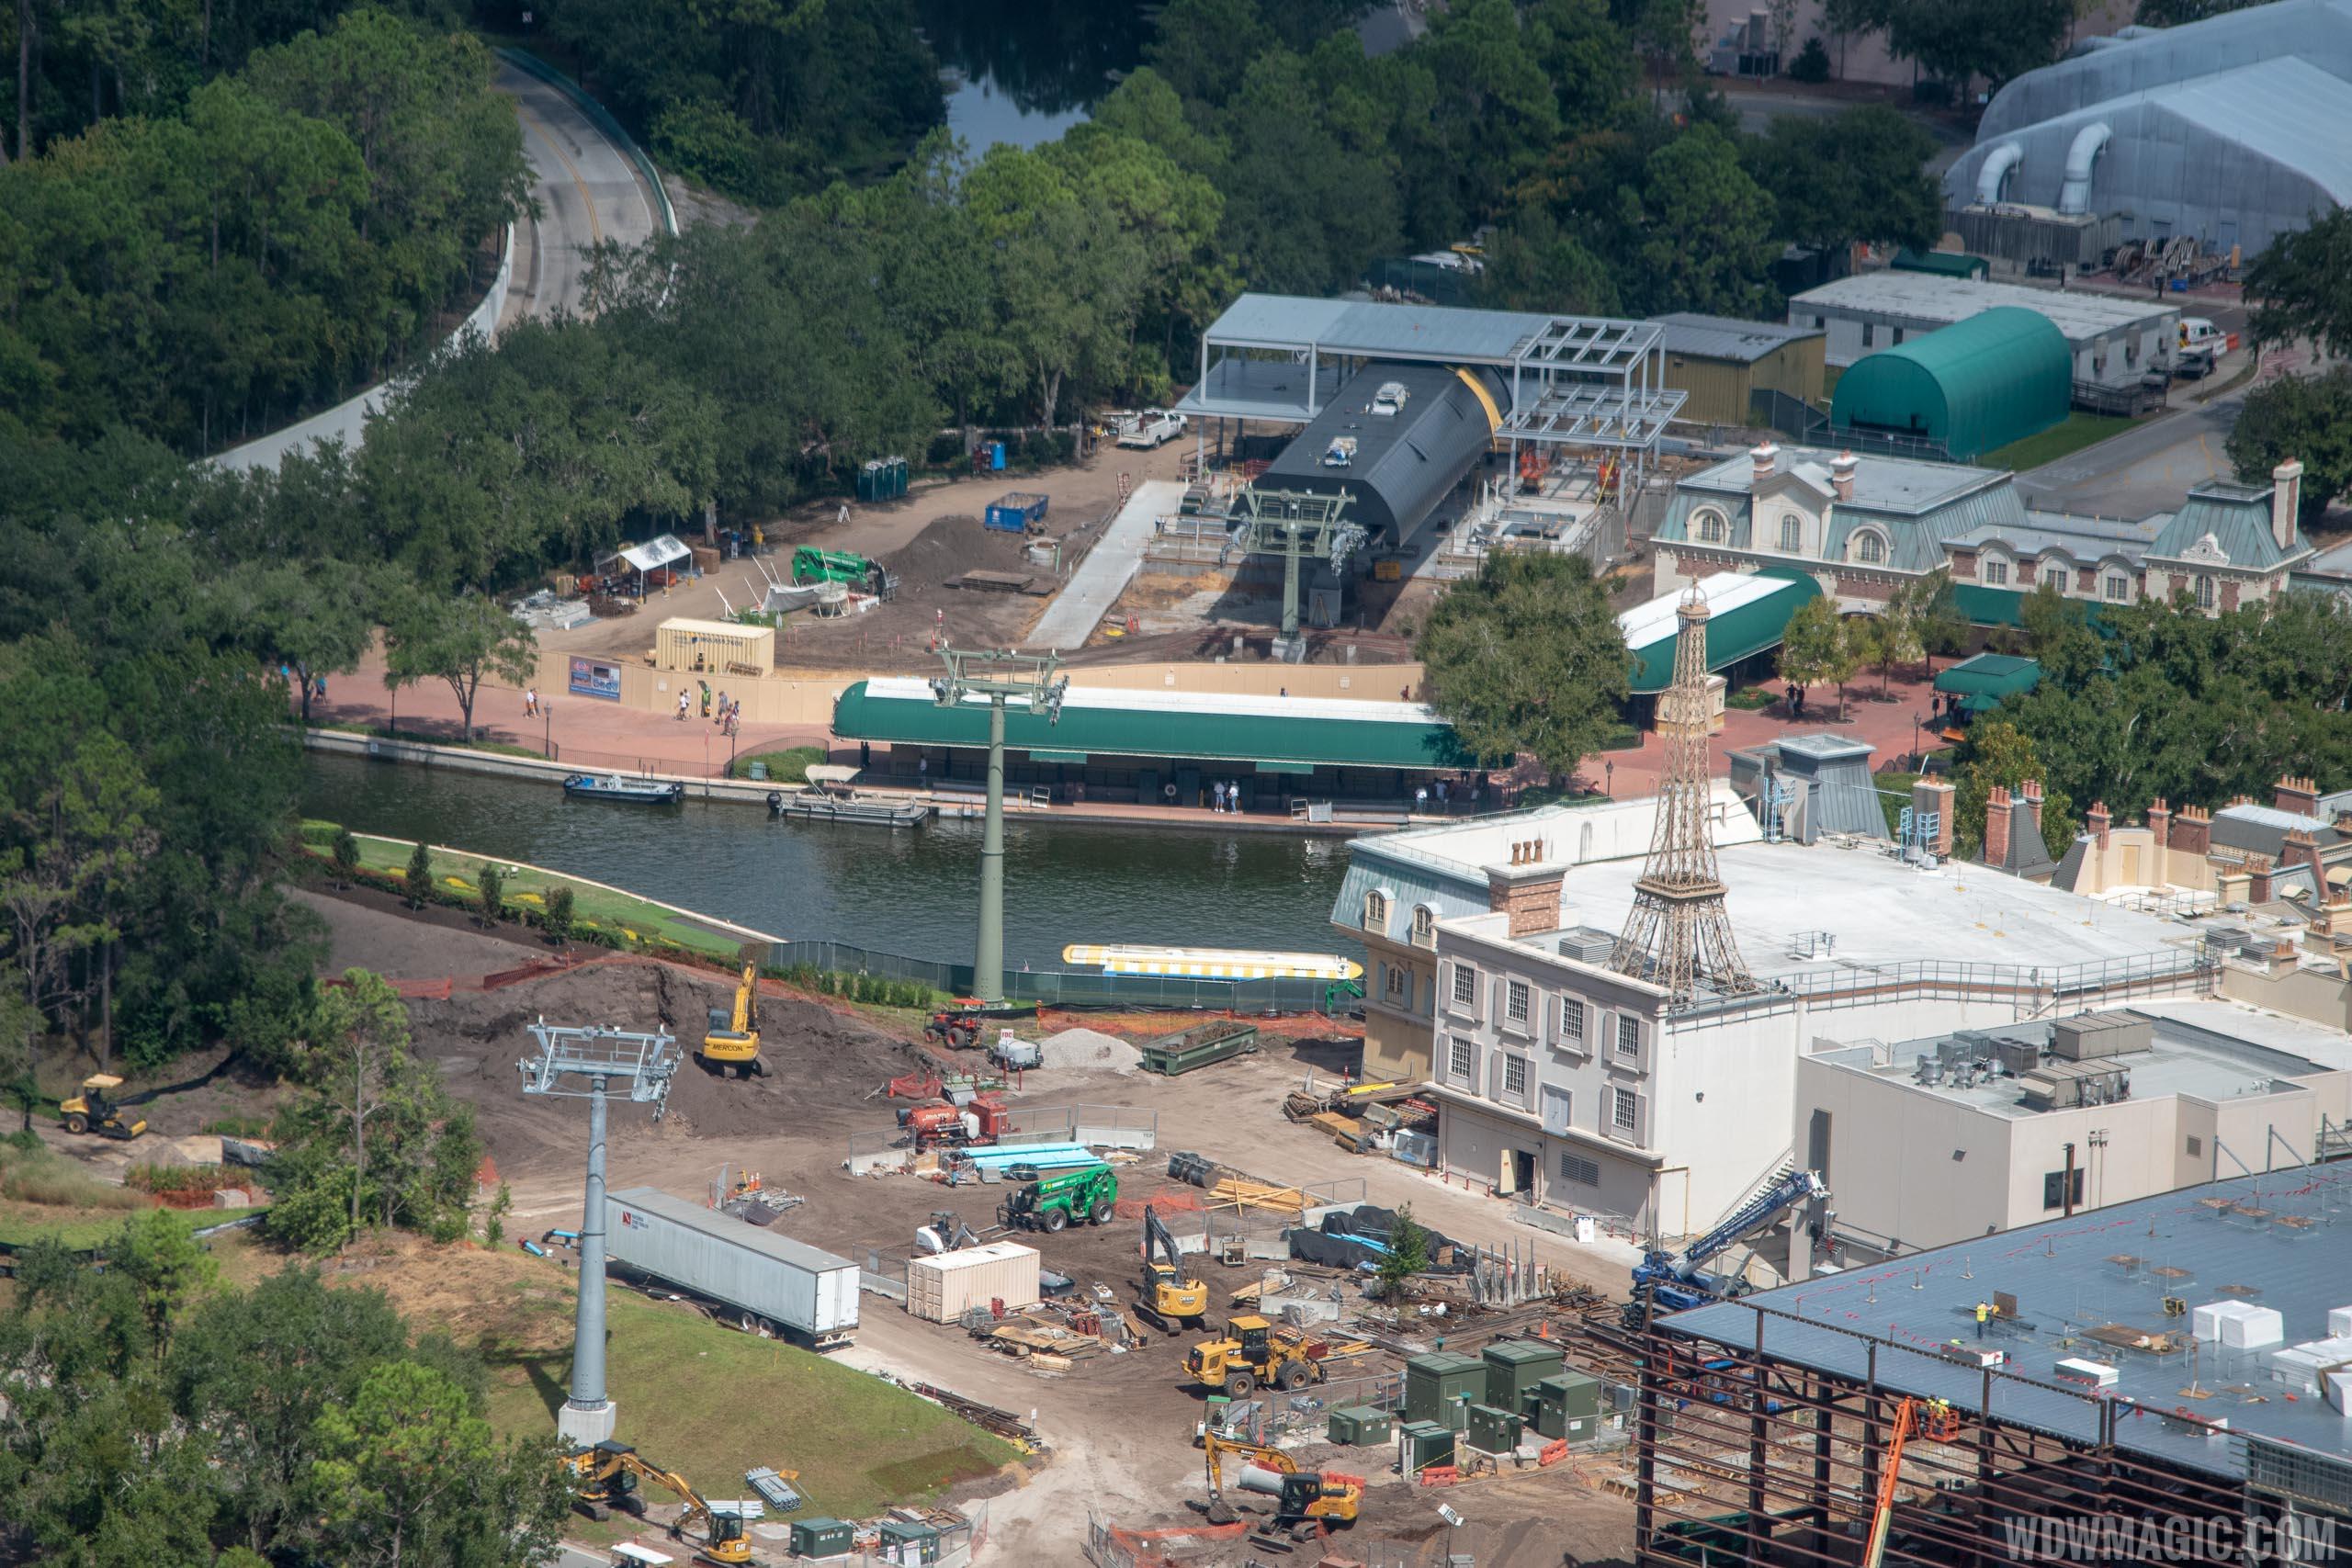 Disney Skyliner construction - Epcot station